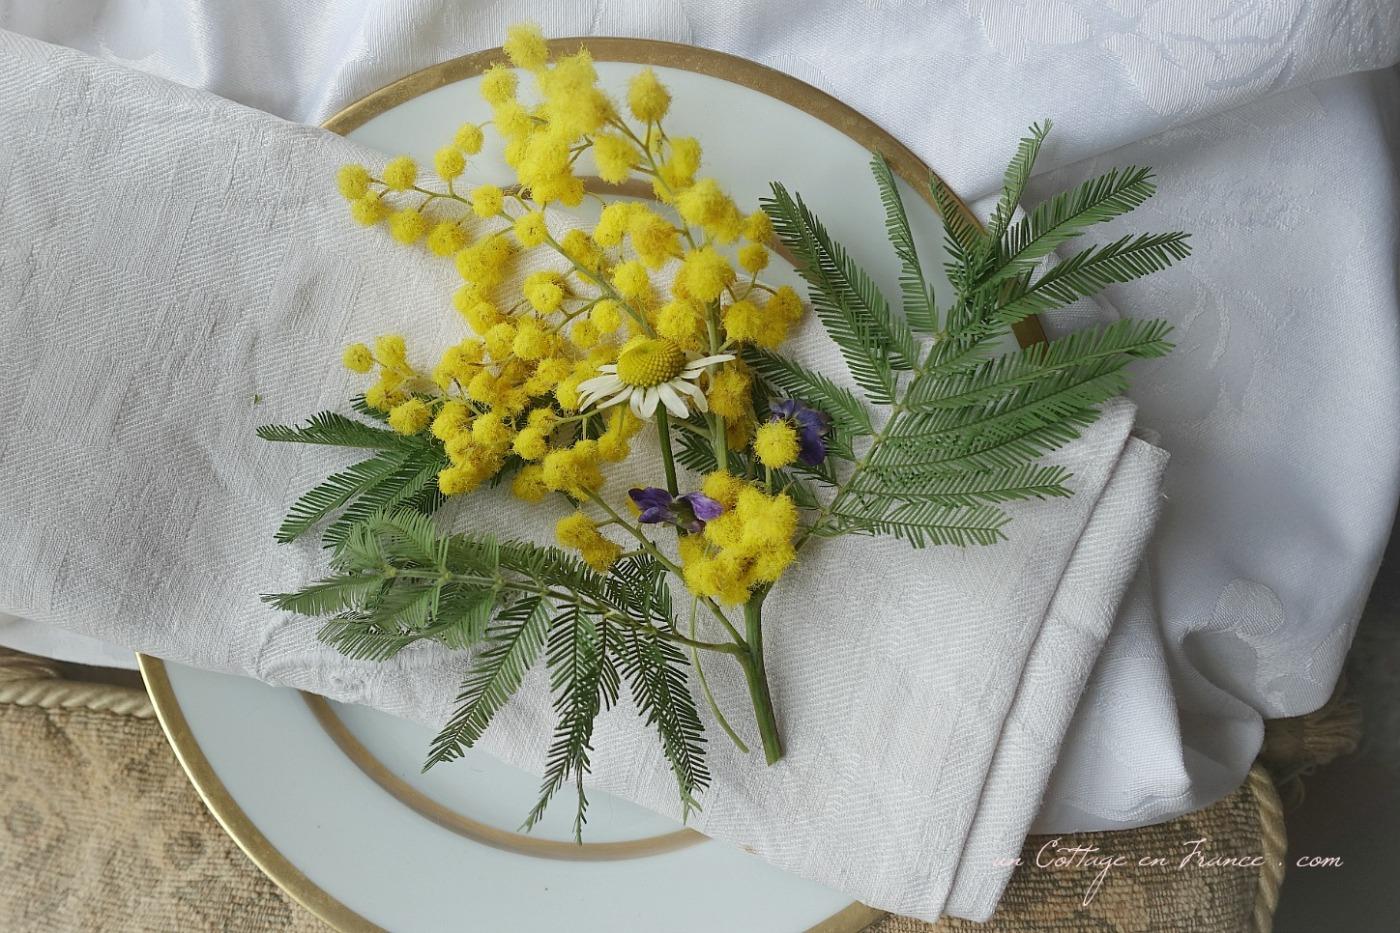 Mimosa en décoration de table, blog country chic